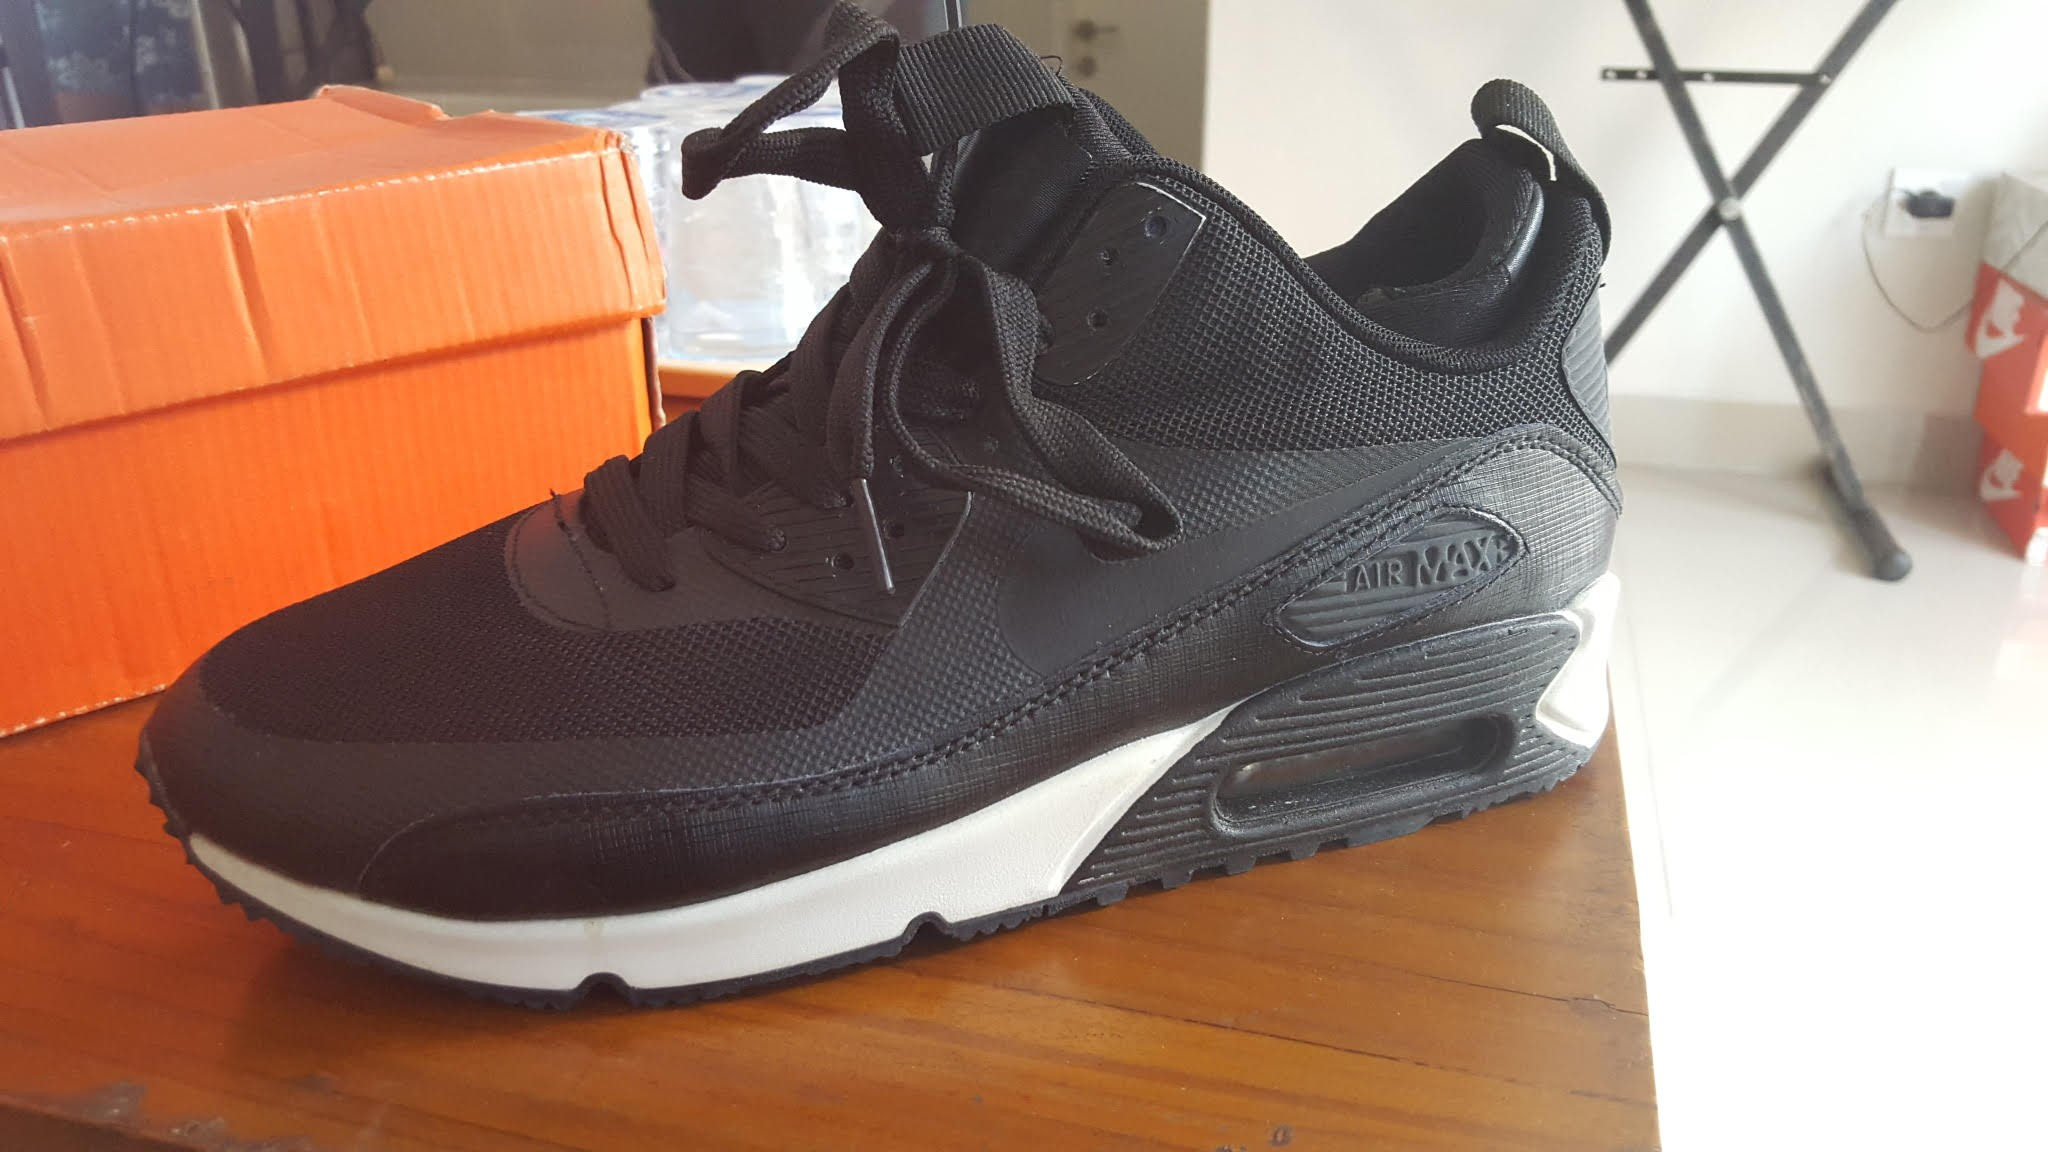 Jual Sepatu Nike Airmax Asli - MJ s shoes store  50e3e8fcab